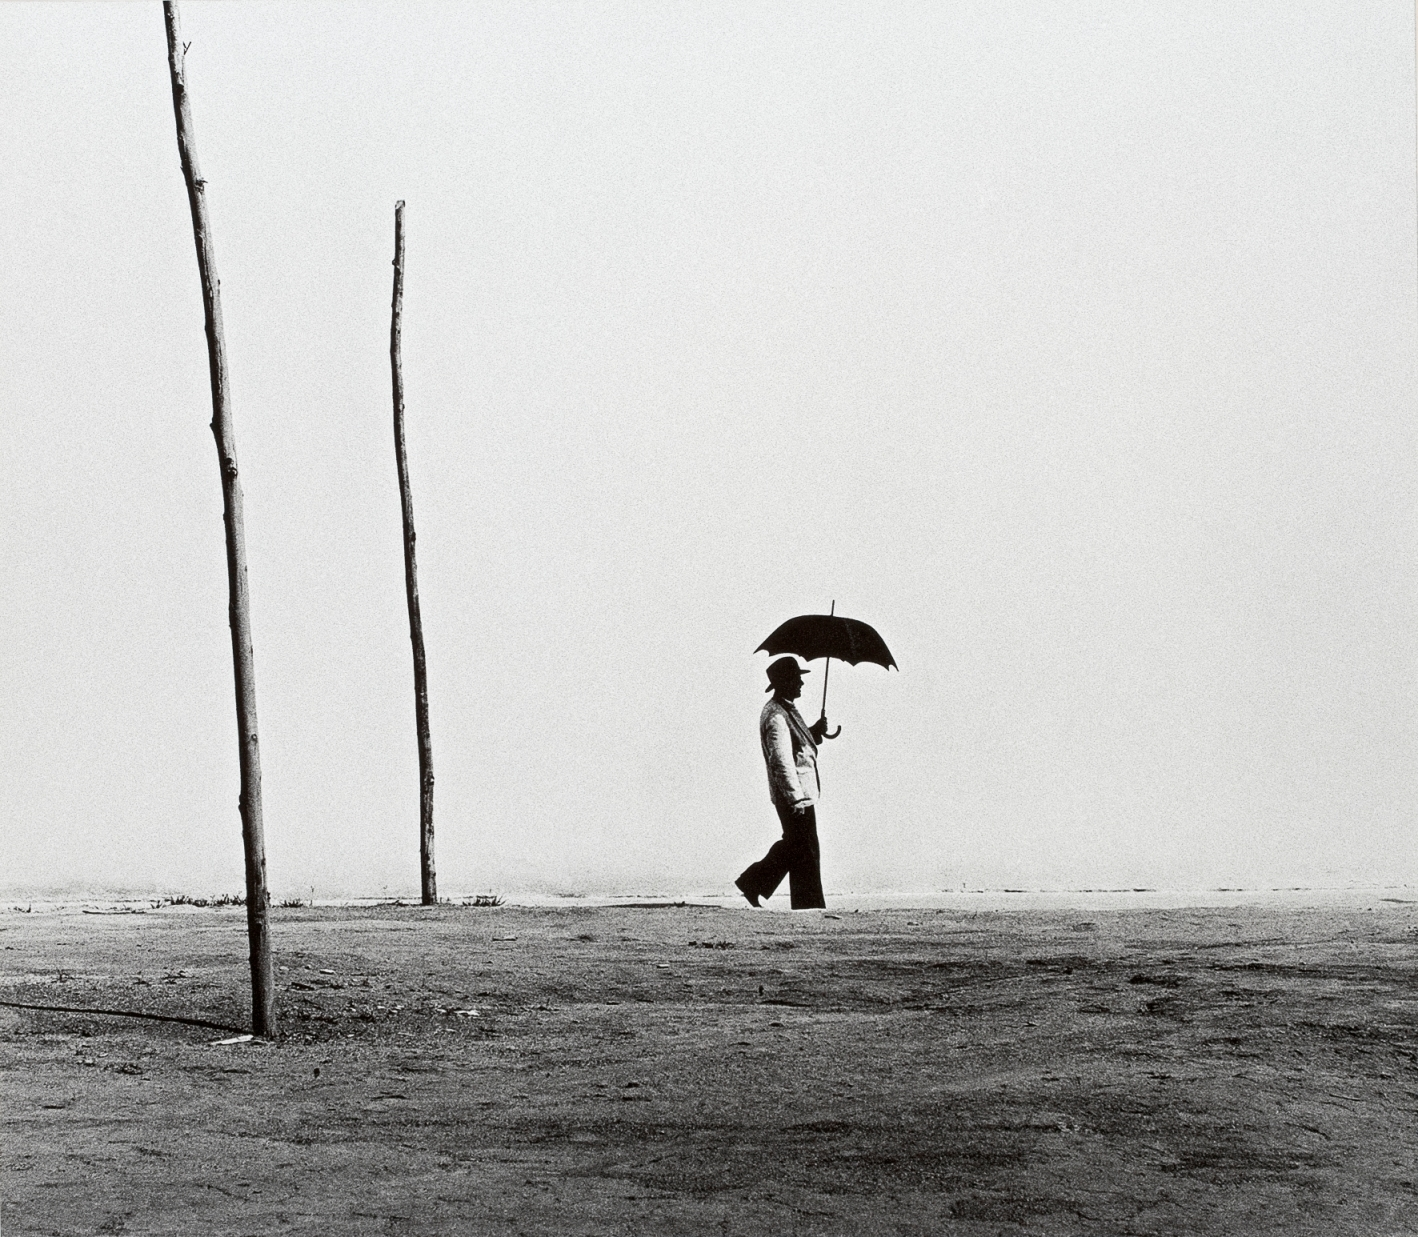 German Lorca, Homem Guarda-Chuva